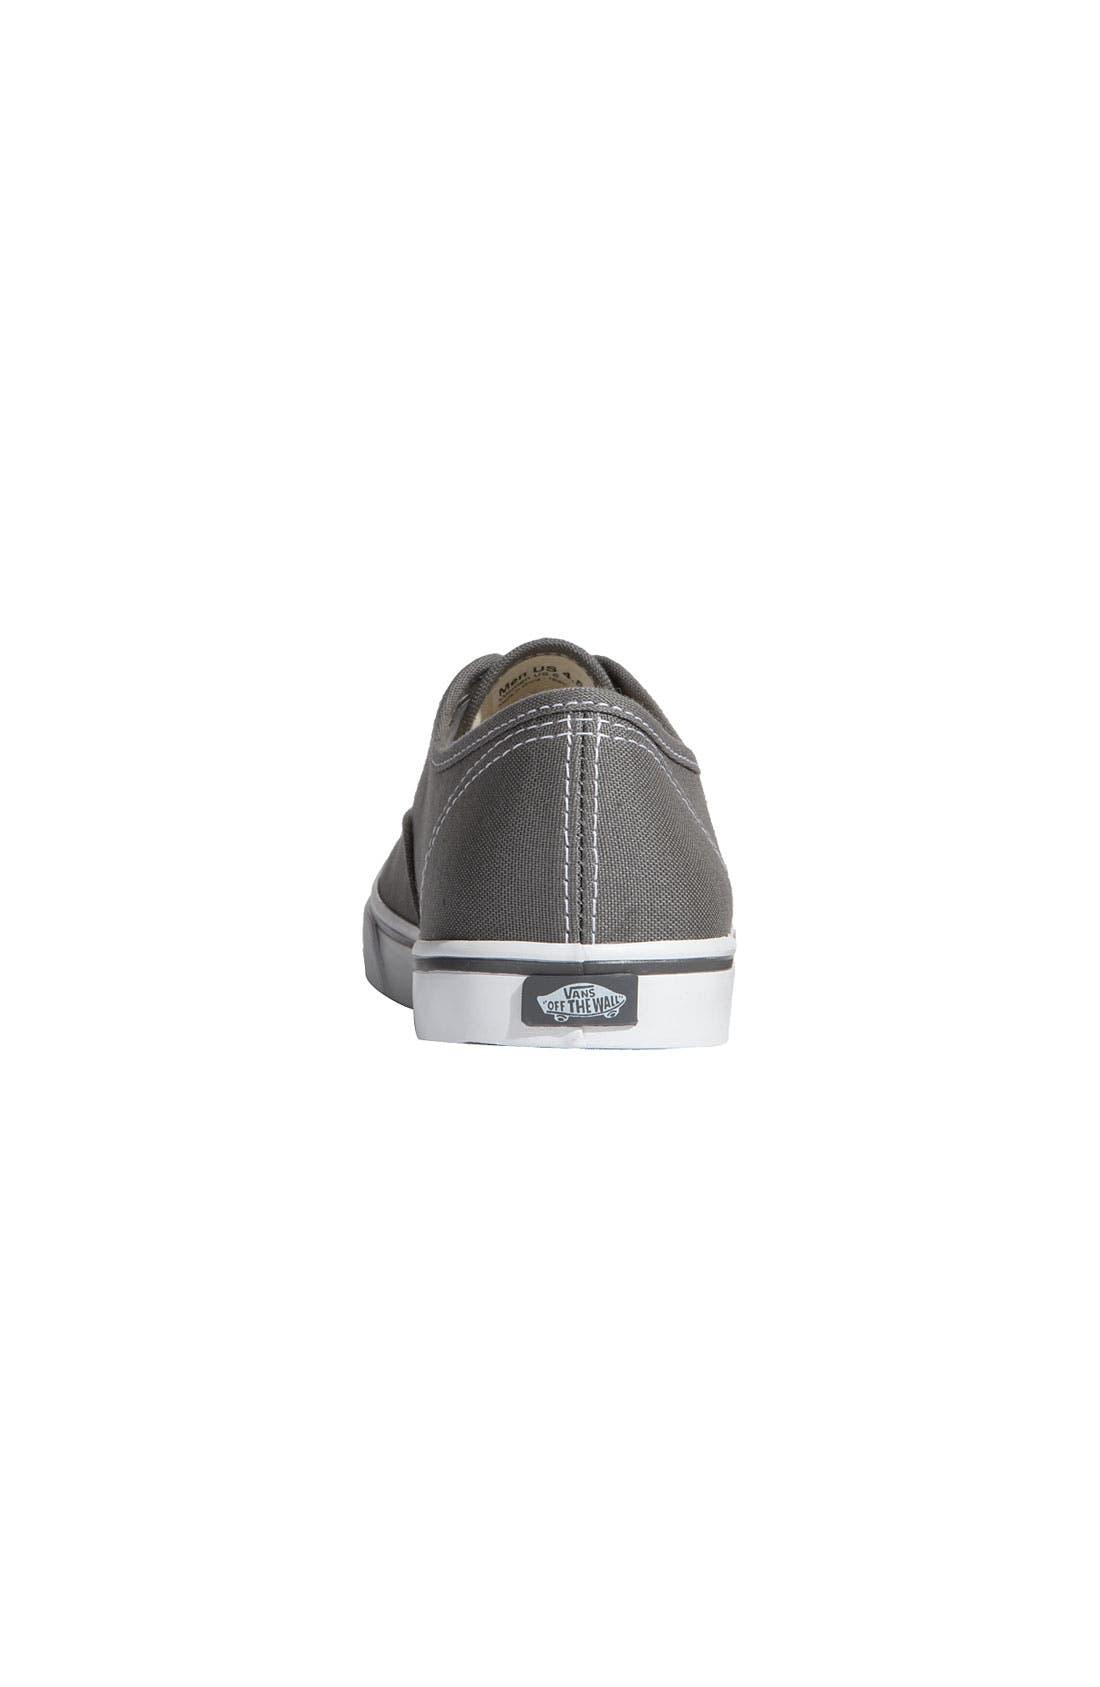 'Authentic - Lo Pro' Sneaker,                             Alternate thumbnail 2, color,                             021